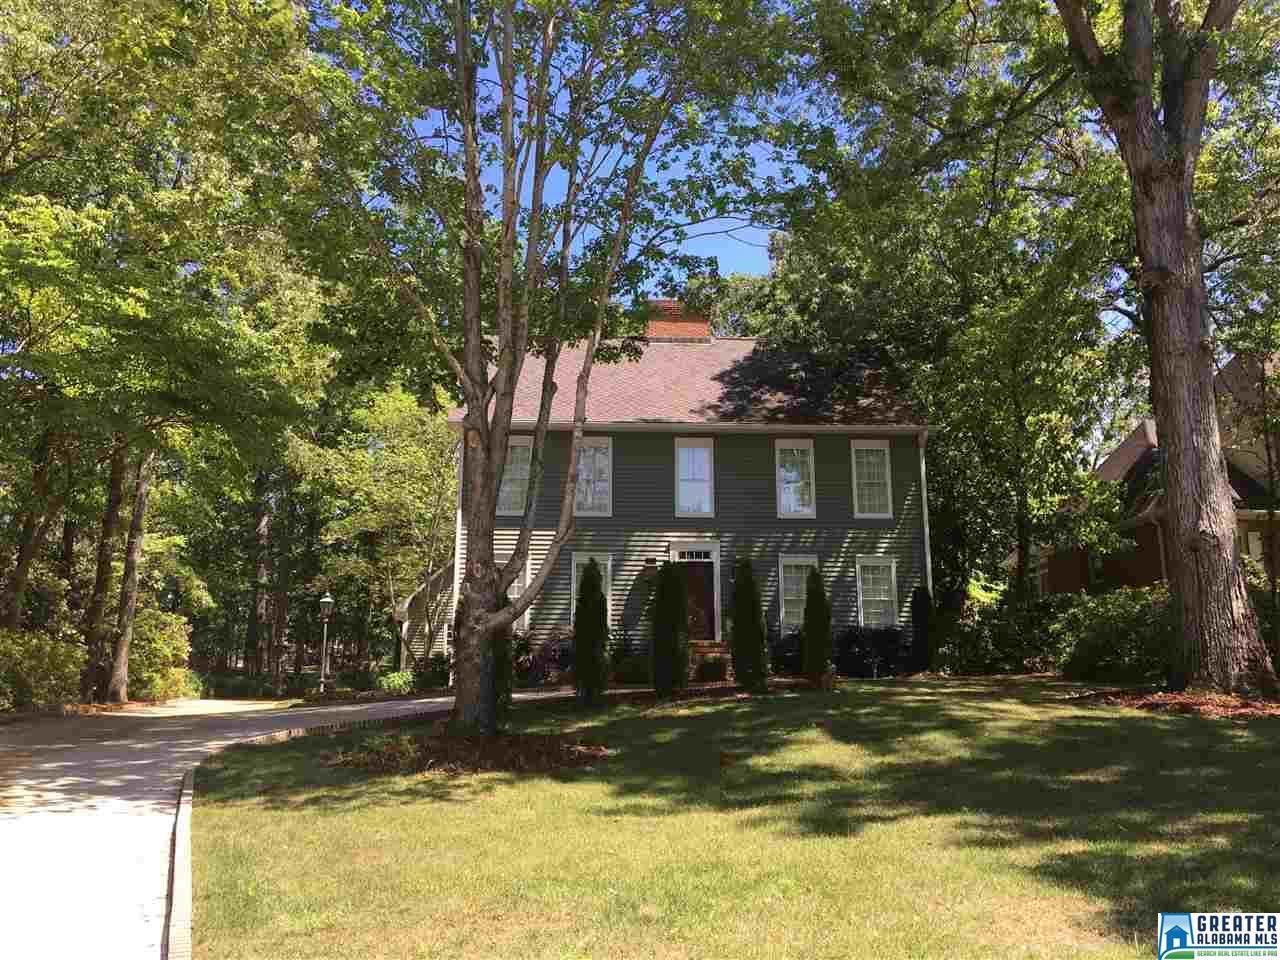 Inverness Subdivision Homes For Sale Birmingham Alabama